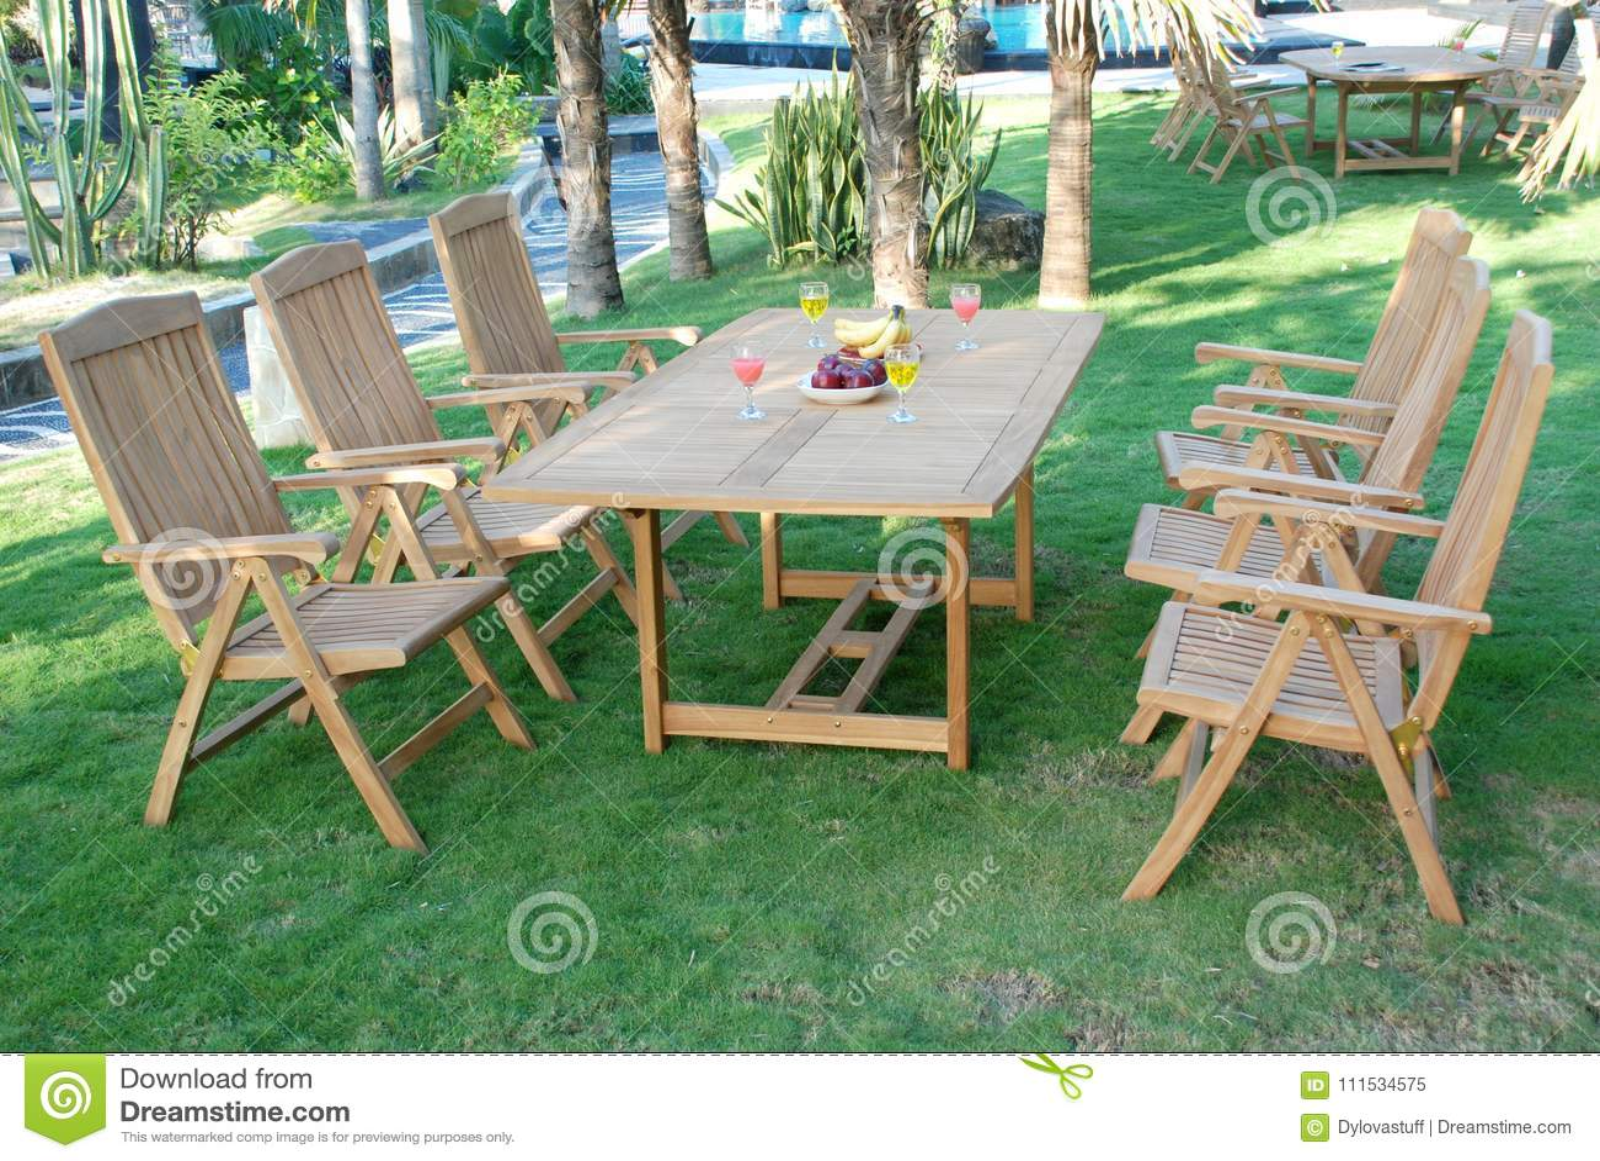 Awesome Teak Garden Furniture Out Door Teak Garden Stock Image Machost Co Dining Chair Design Ideas Machostcouk